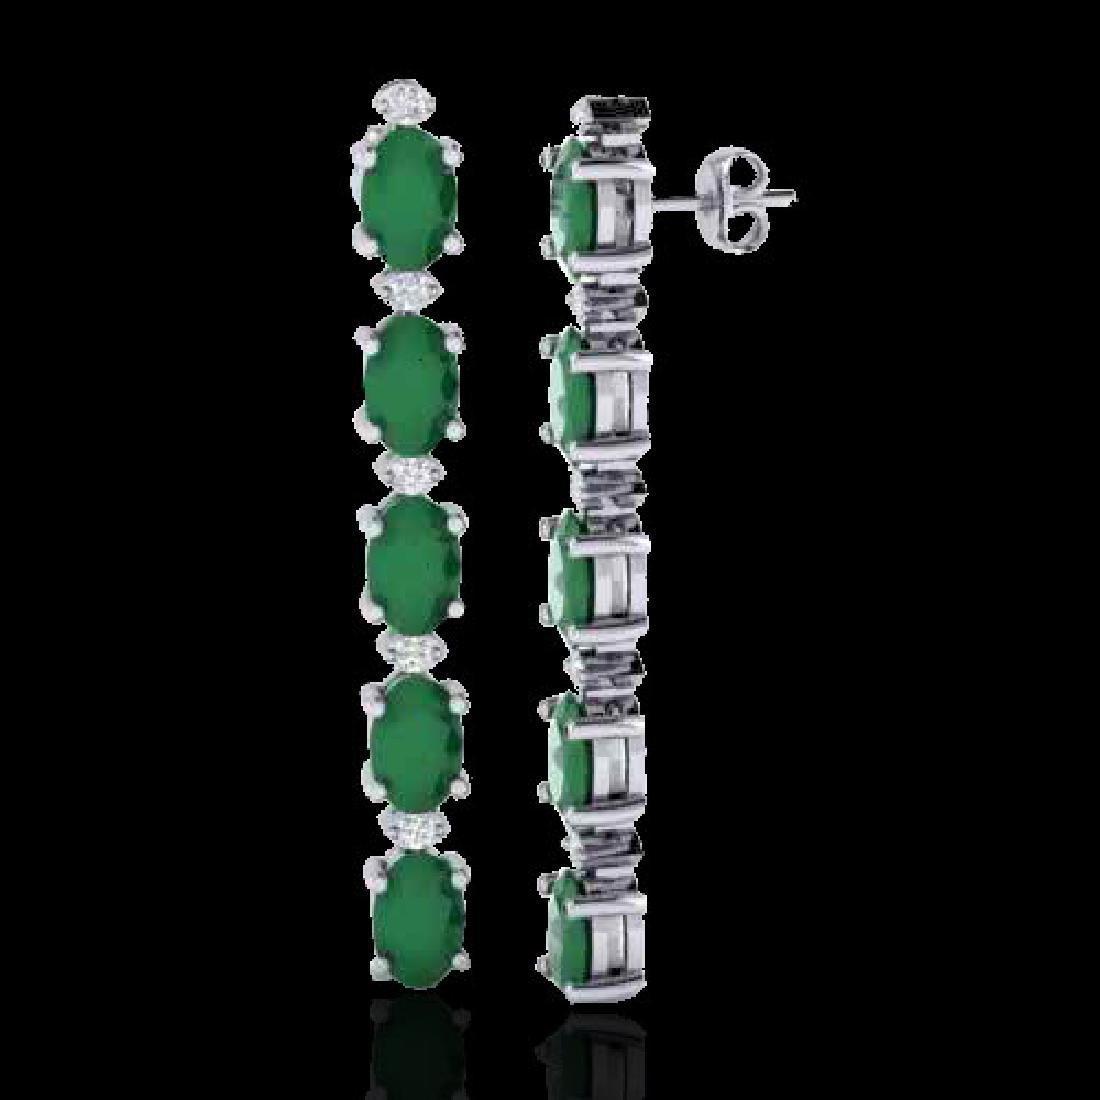 7 CTW Emerald & VS/SI Diamond Tennis Earrings 10K White - 2